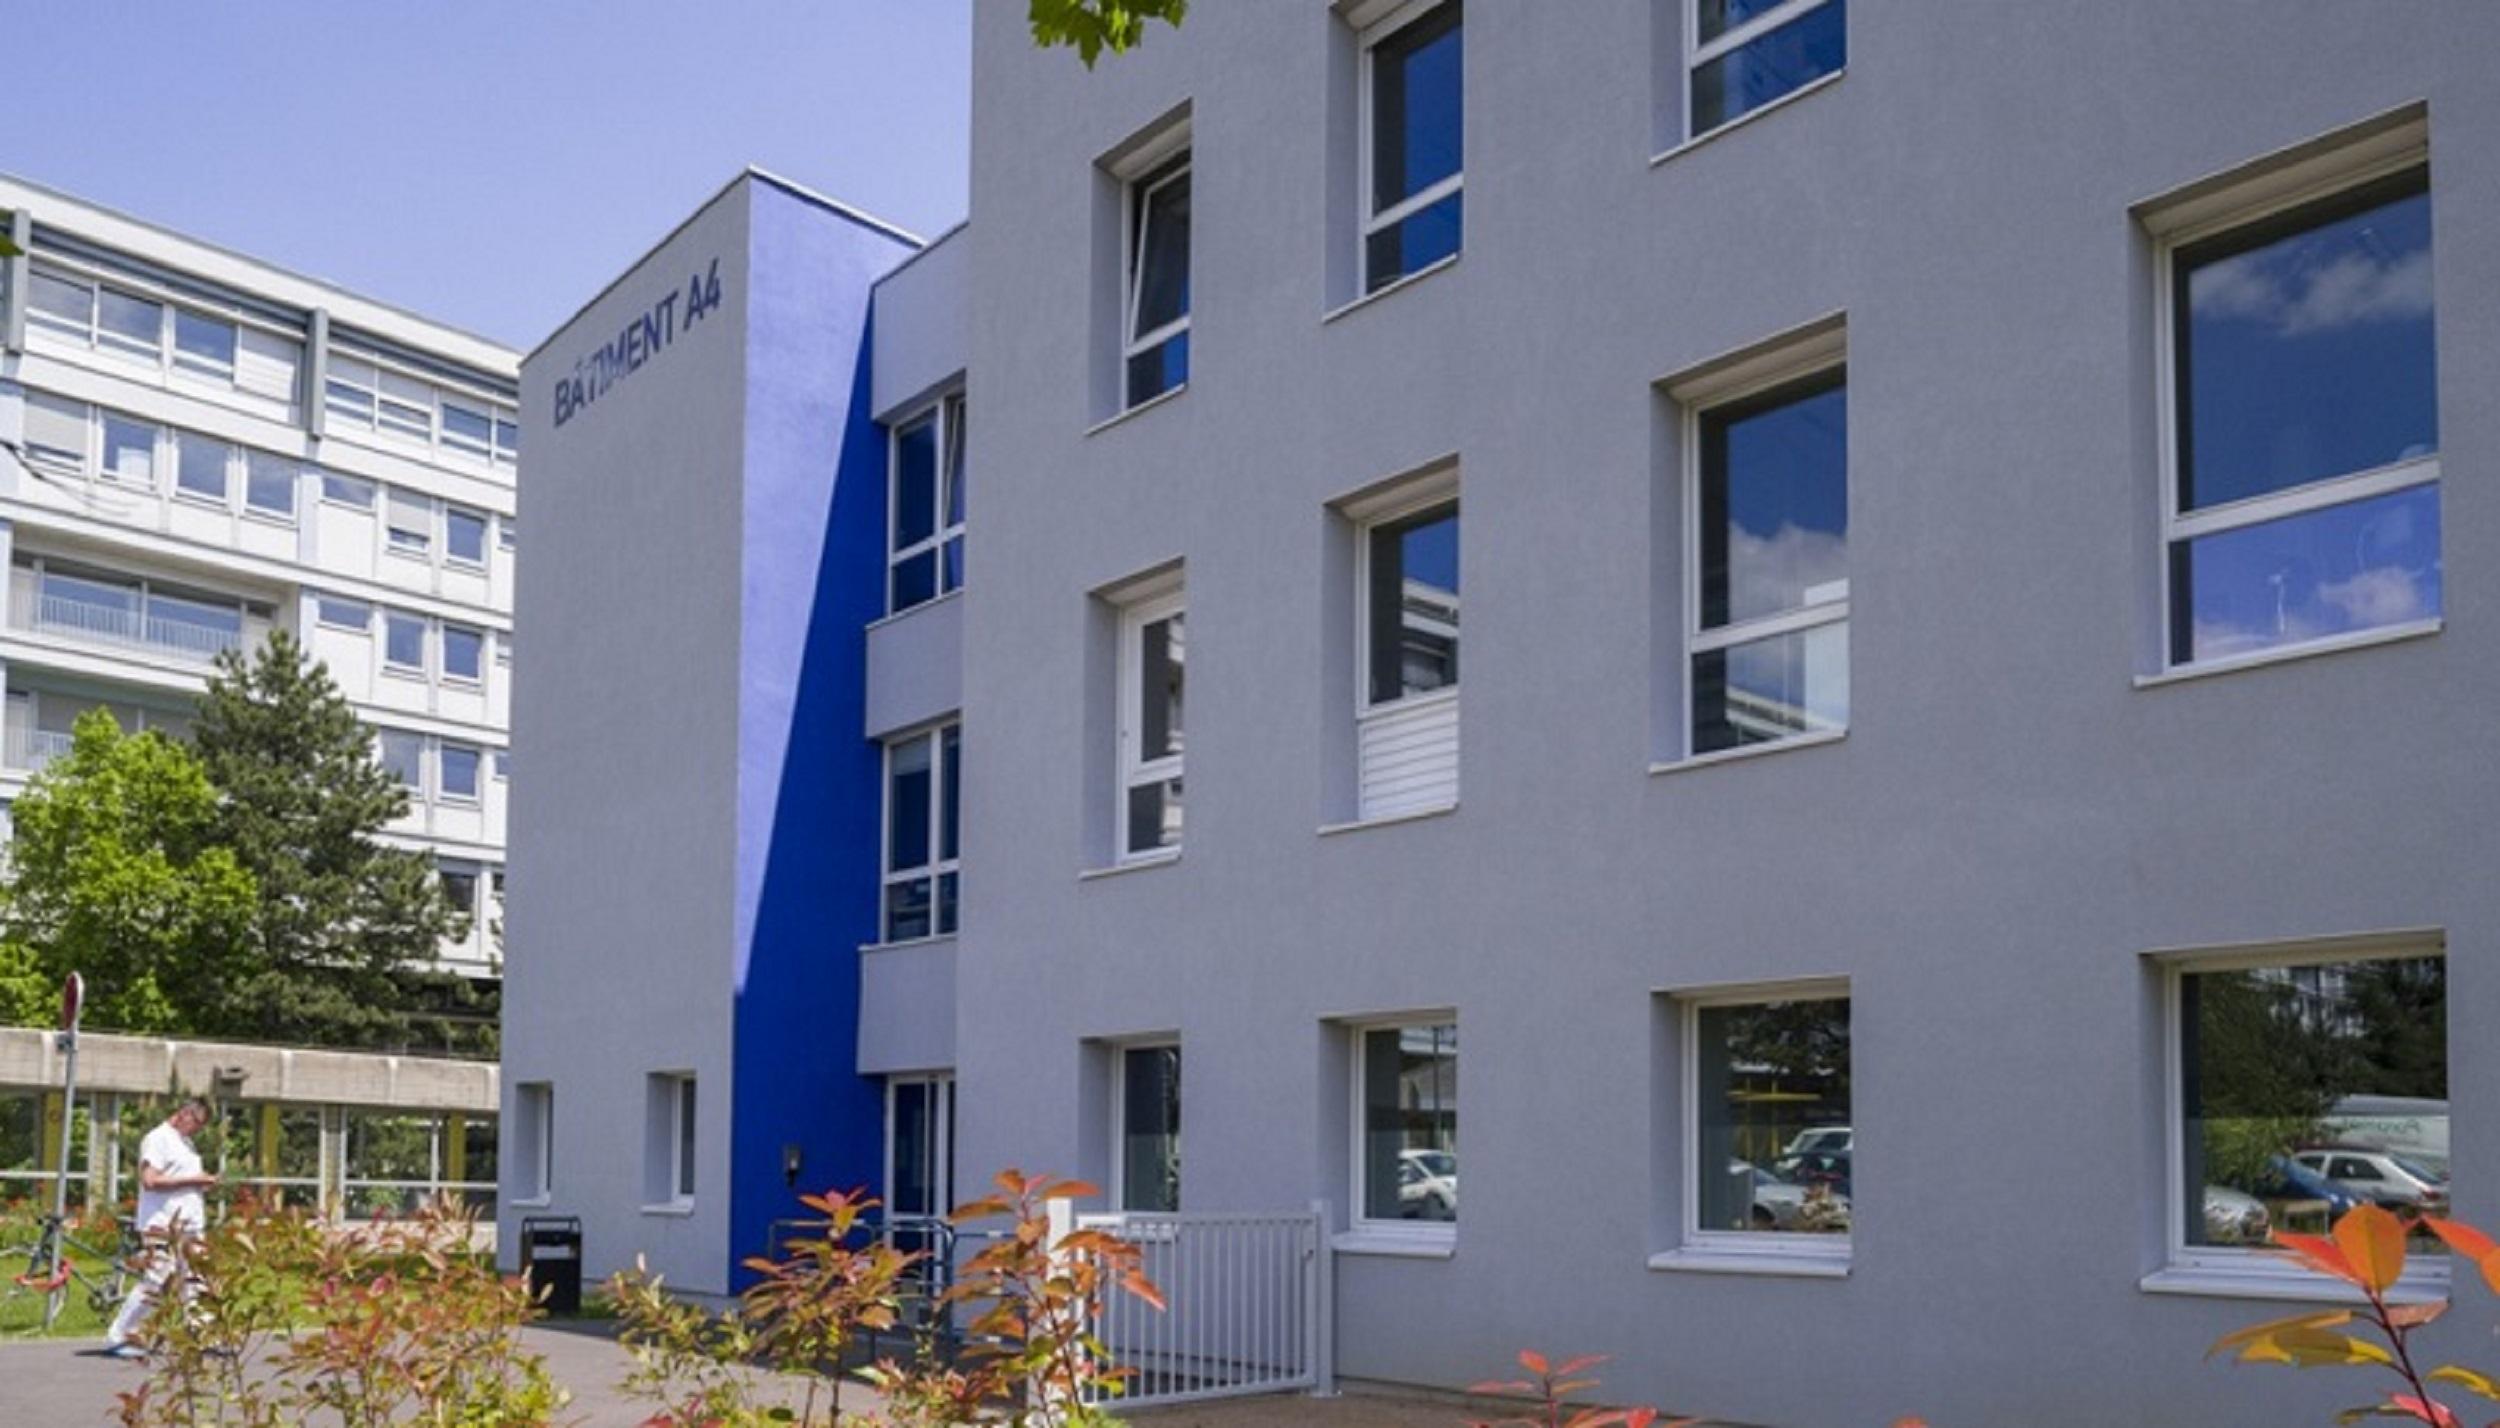 USLD Hôpital Louis PRADEL - BRON - 5